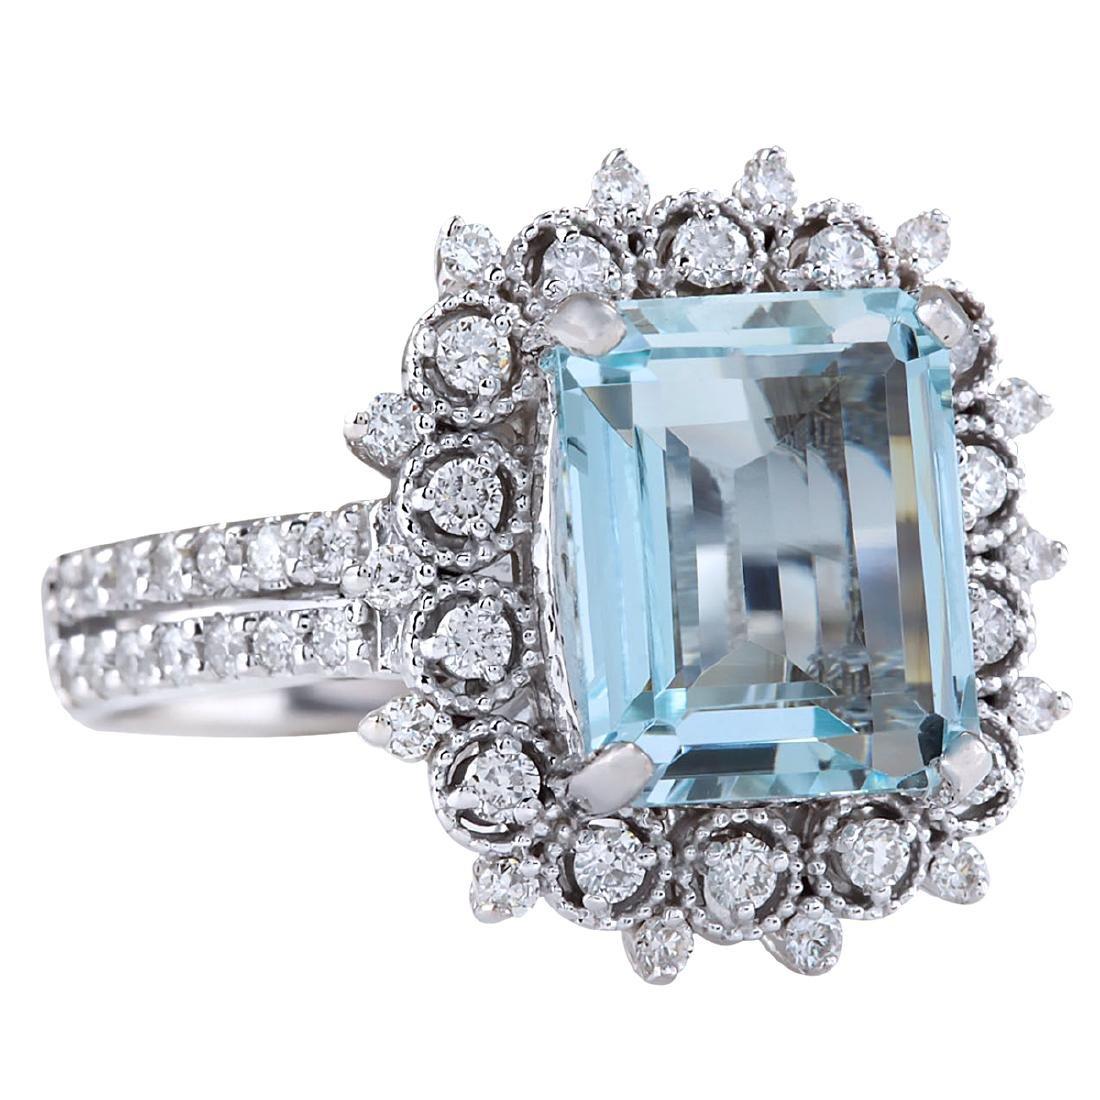 4.15CTW Natural Aquamarine And Diamond Ring In 18K - 2